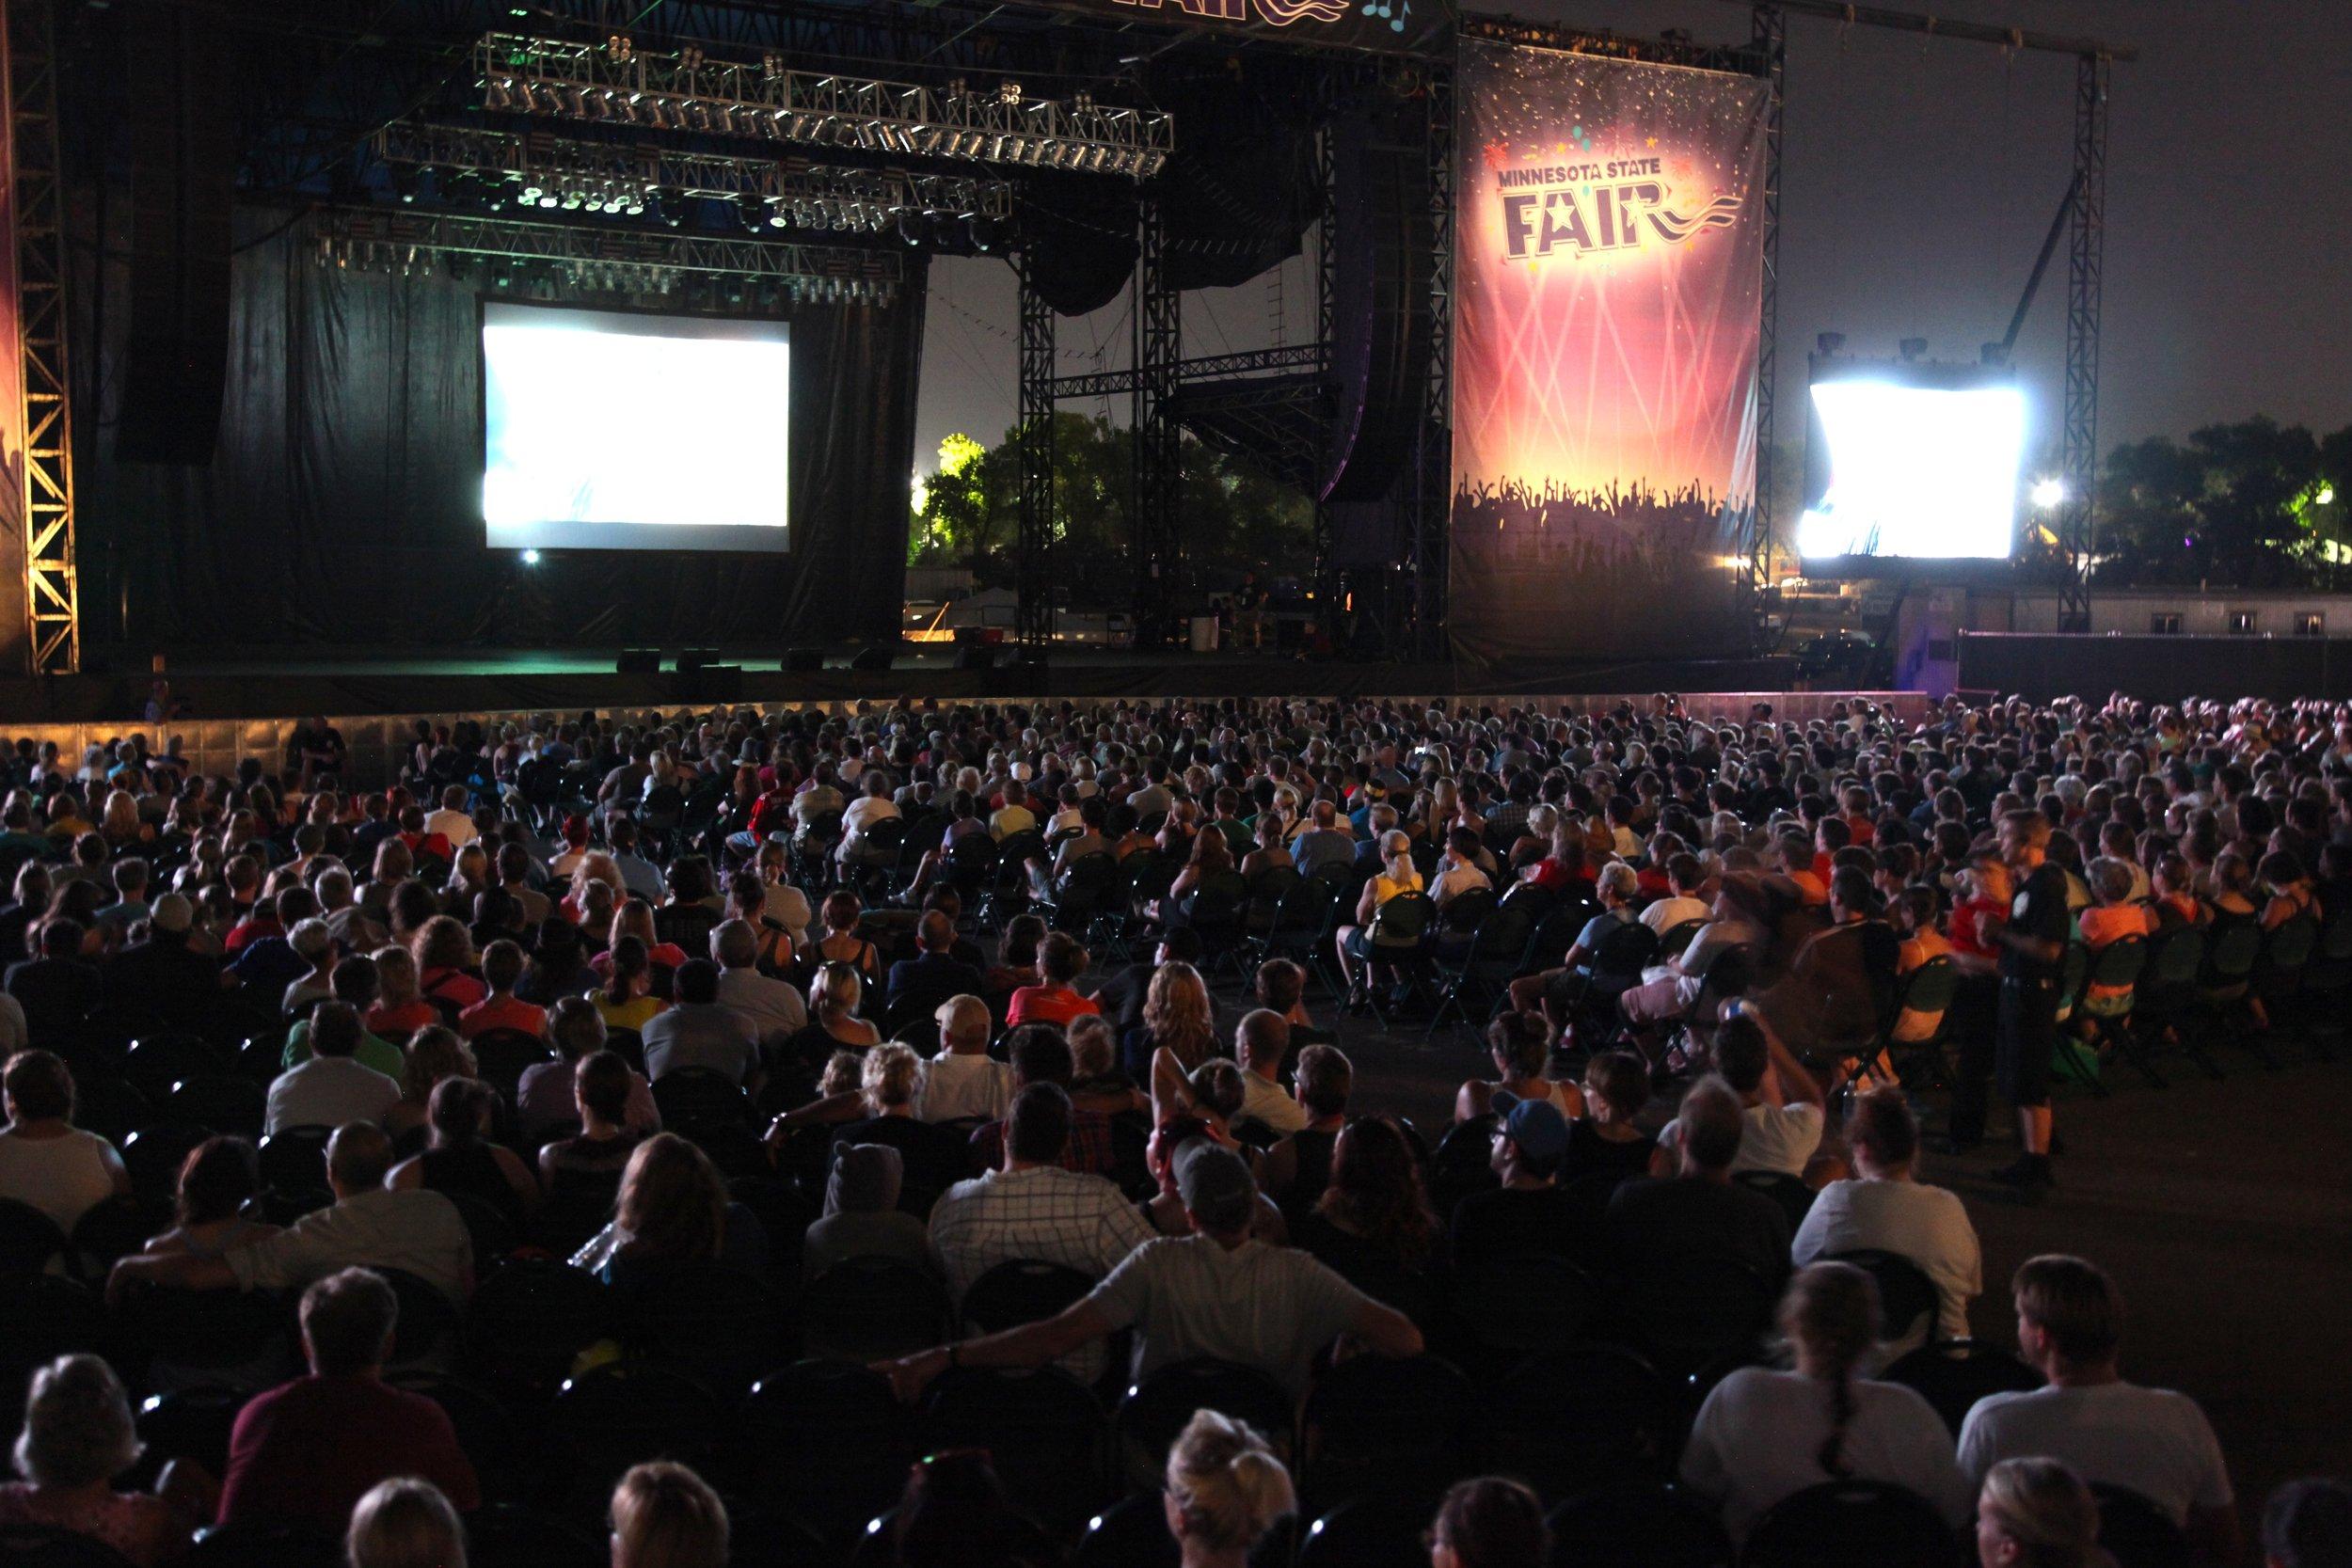 Cat Videos Film Festival - Minnesota State Fair